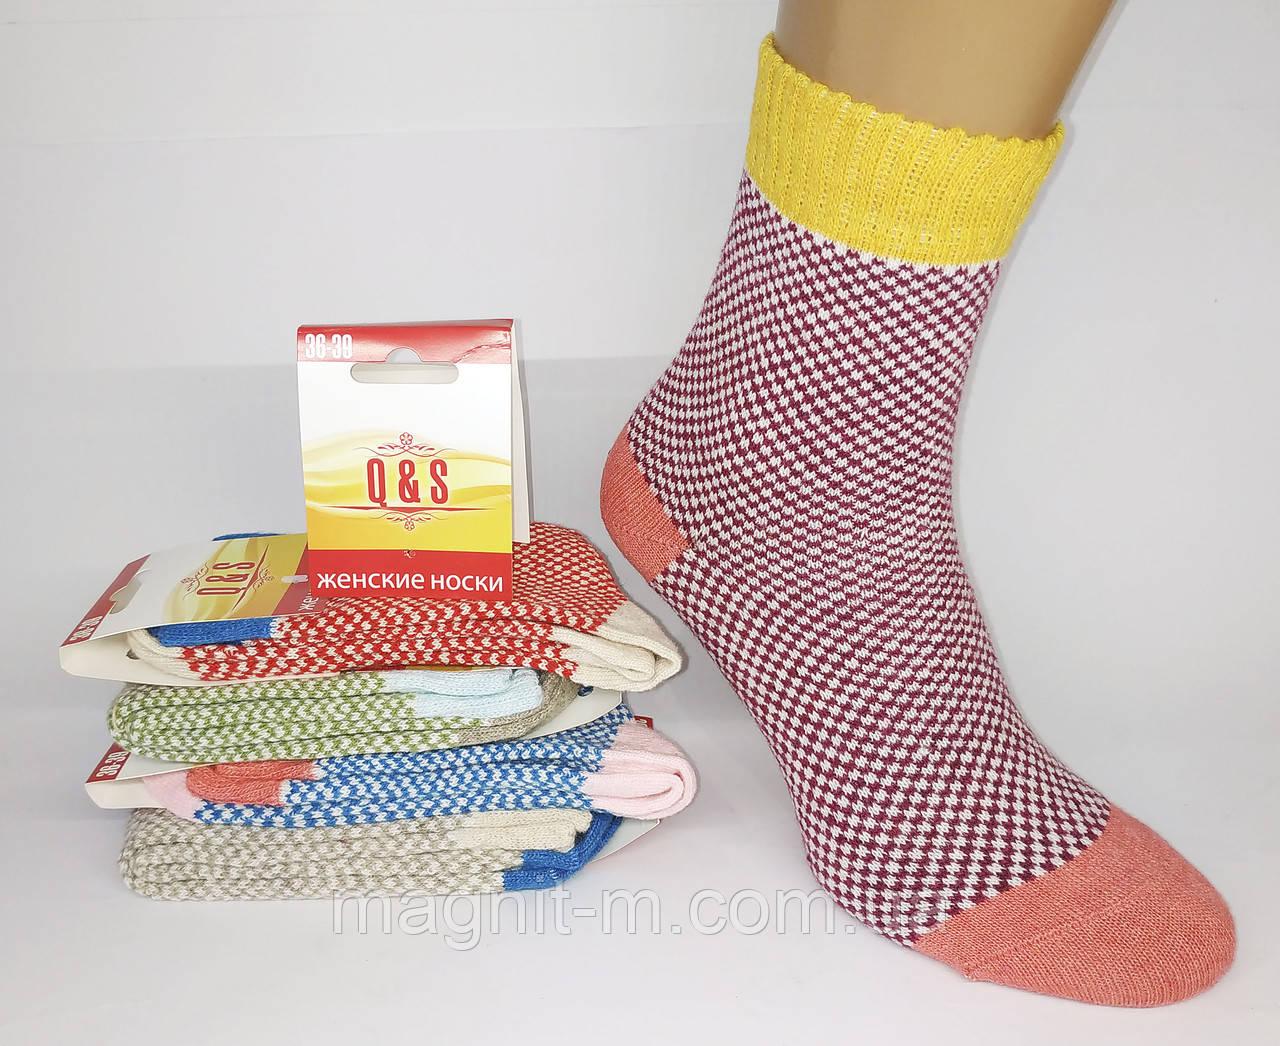 "Яркие женские зимние носки  фирмы ""Q&S"". Крупная вязка. Узор шахматка."